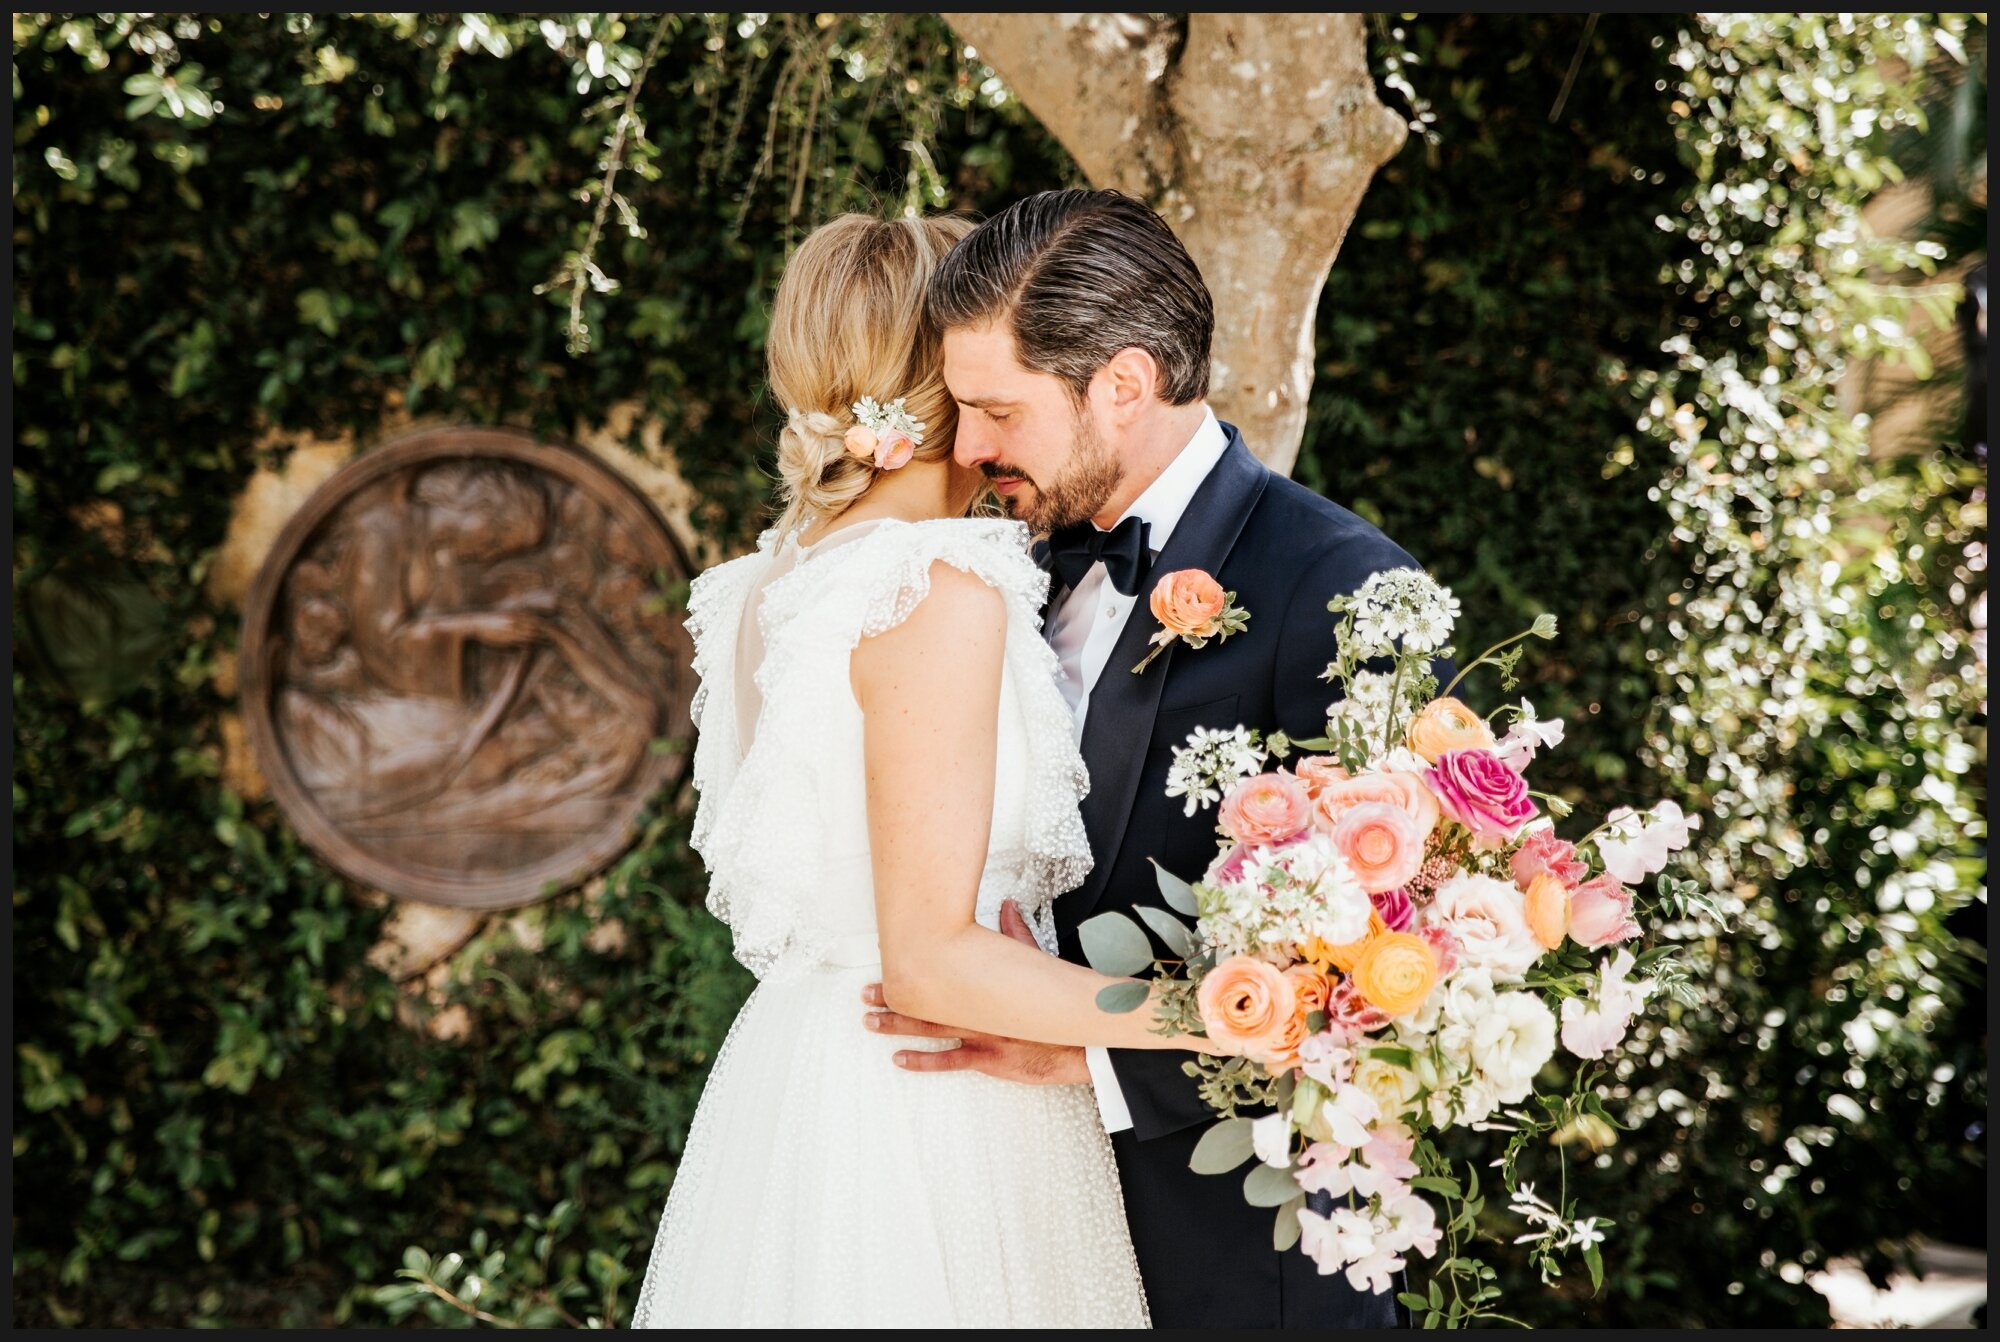 Orlando-Wedding-Photographer-destination-wedding-photographer-florida-wedding-photographer-hawaii-wedding-photographer_0739.jpg